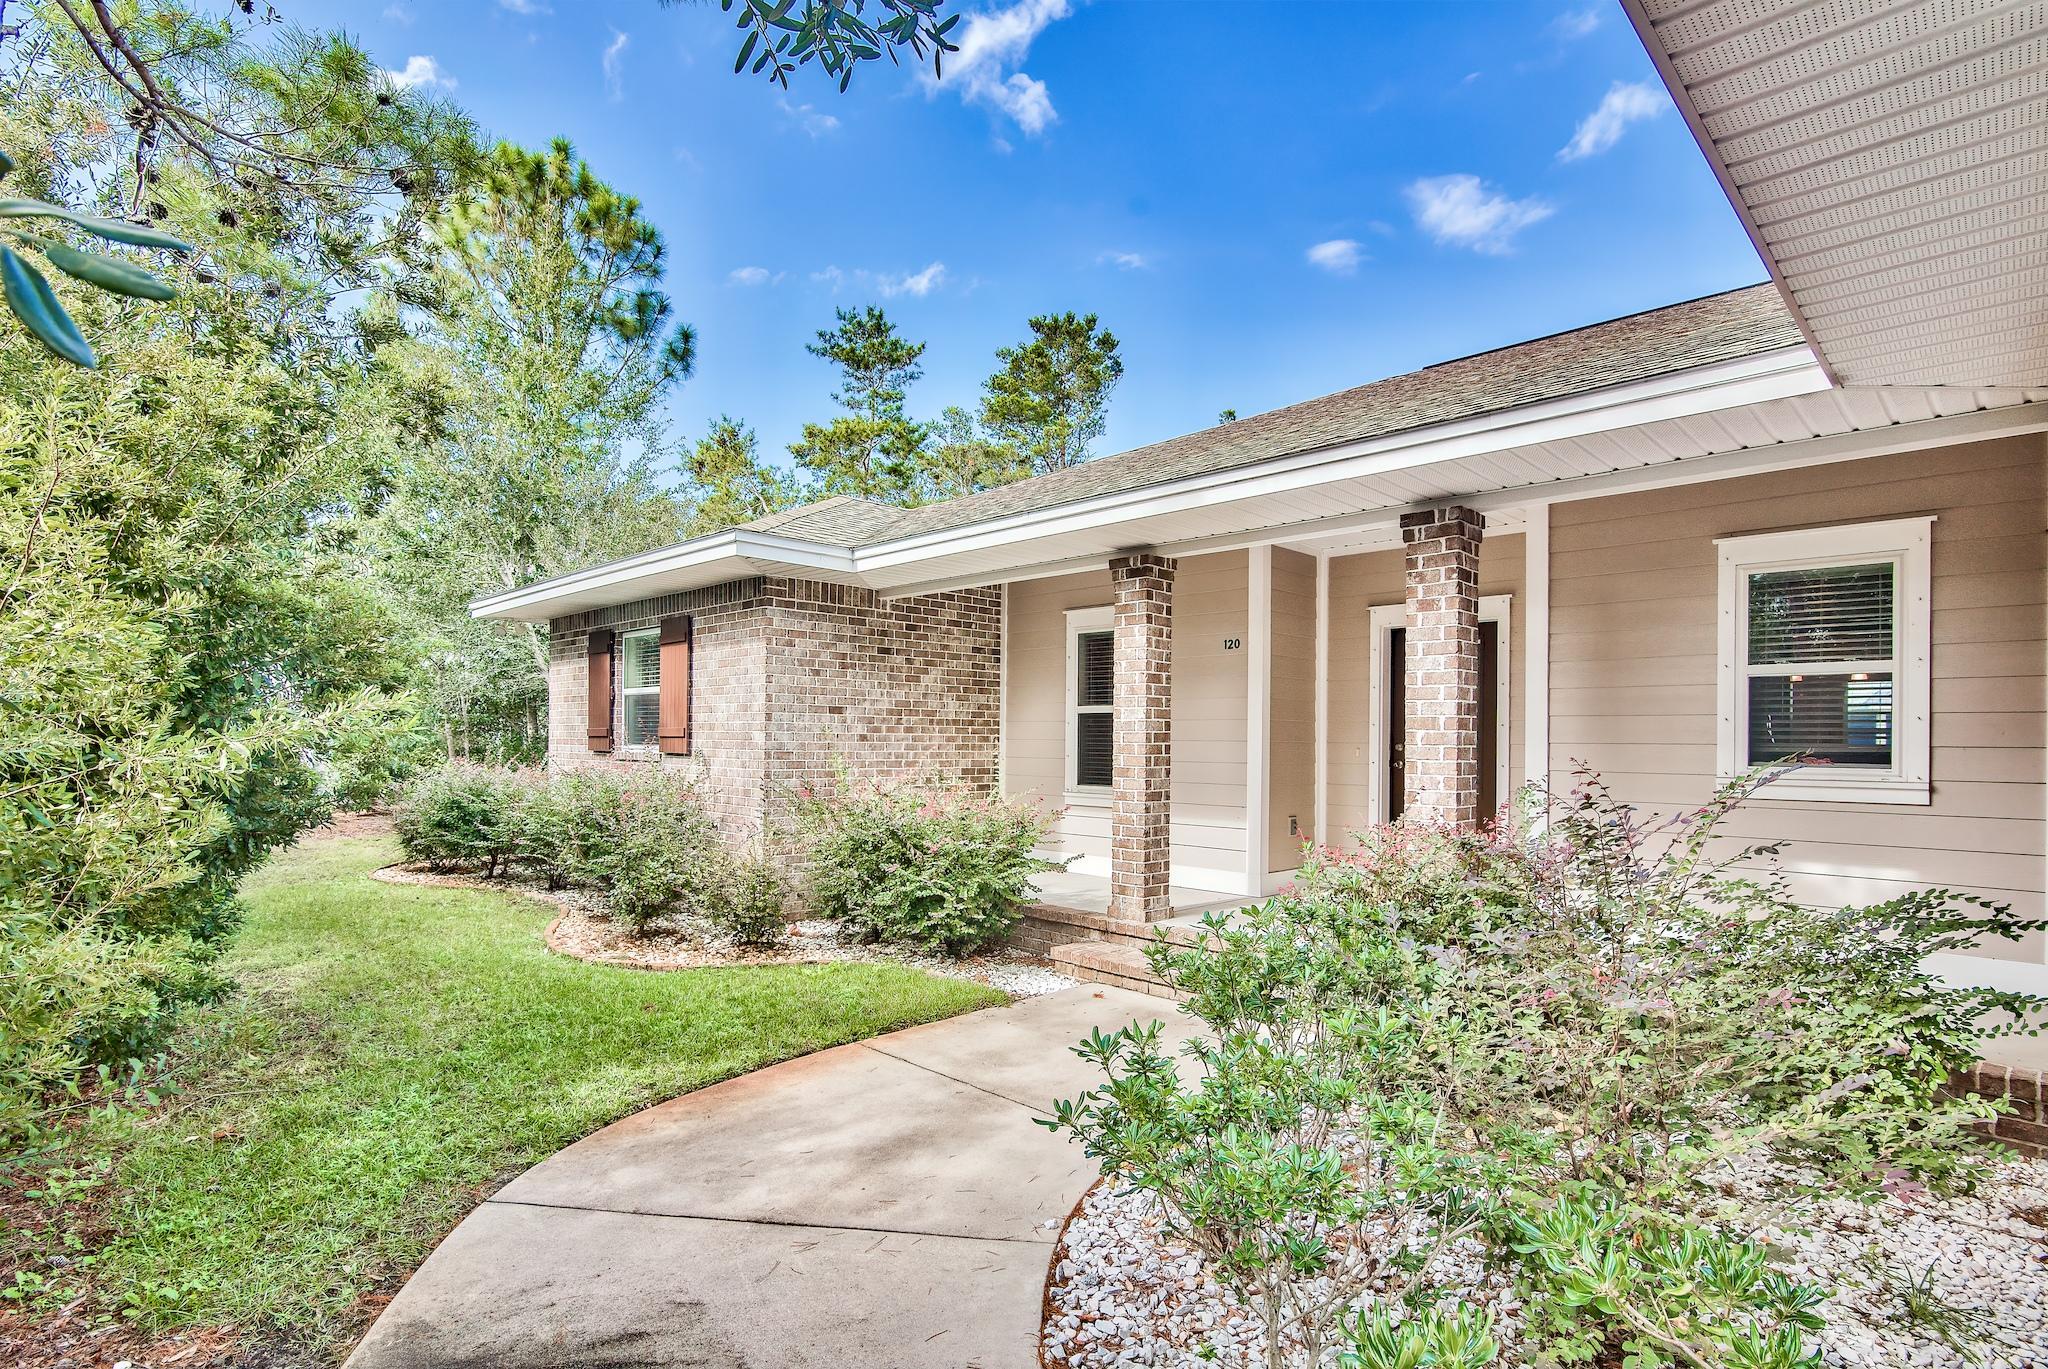 Photo of home for sale at 120 Wind Spray, Santa Rosa Beach FL